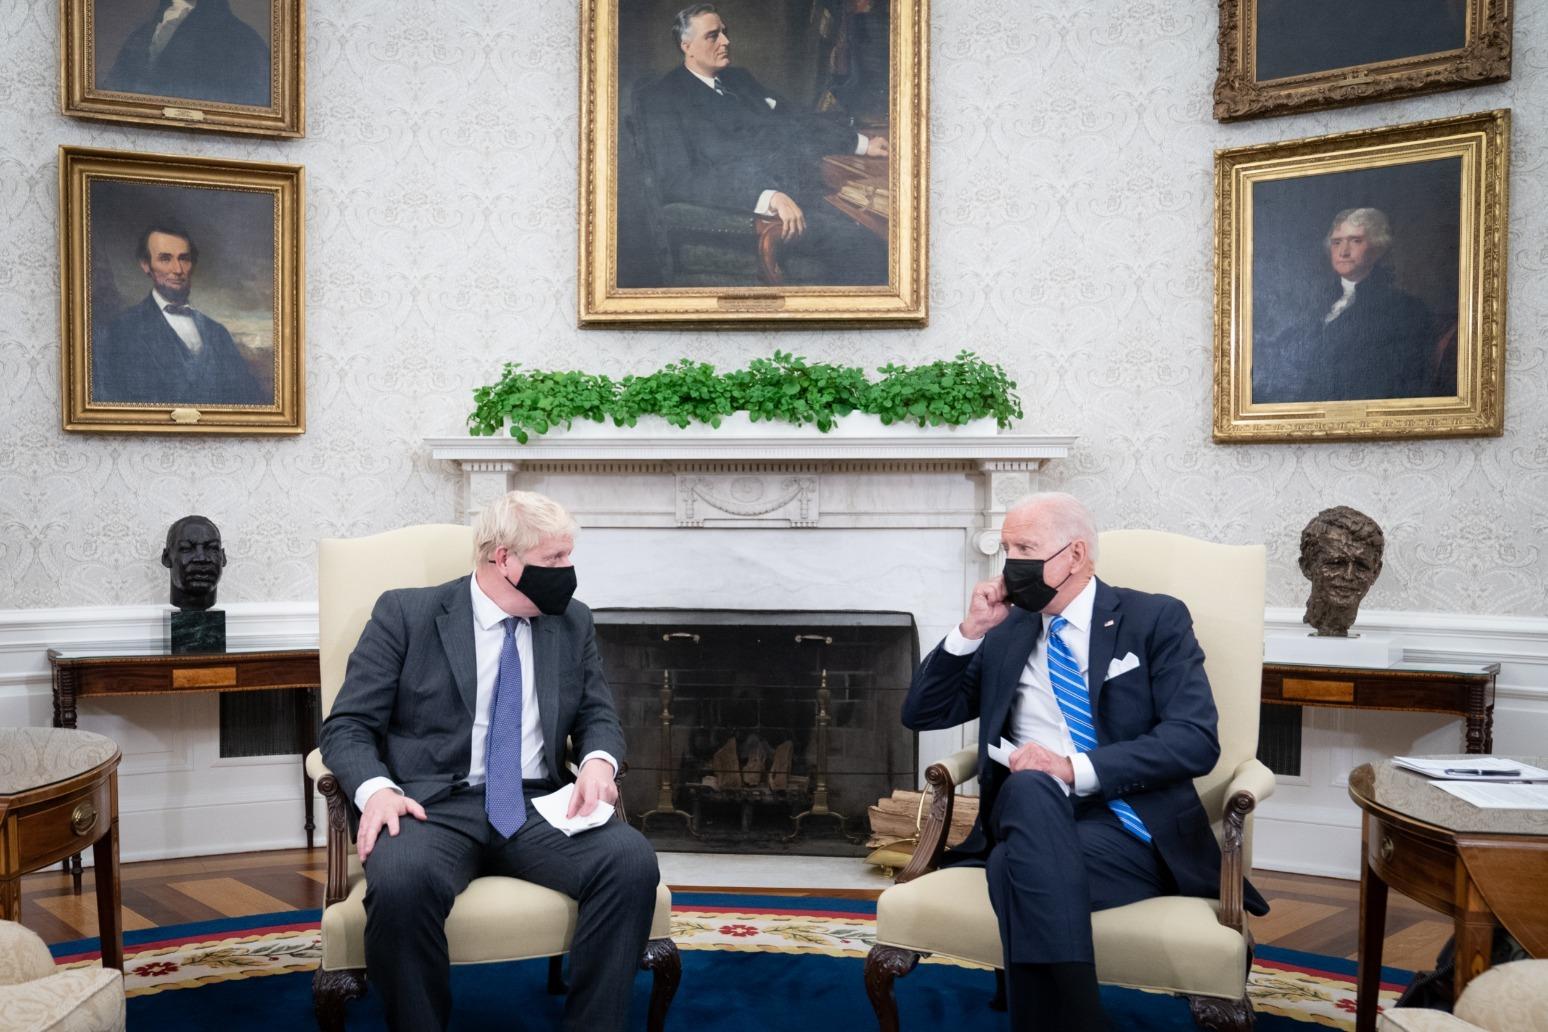 Joe Biden plays down chances of striking trade deal with UK